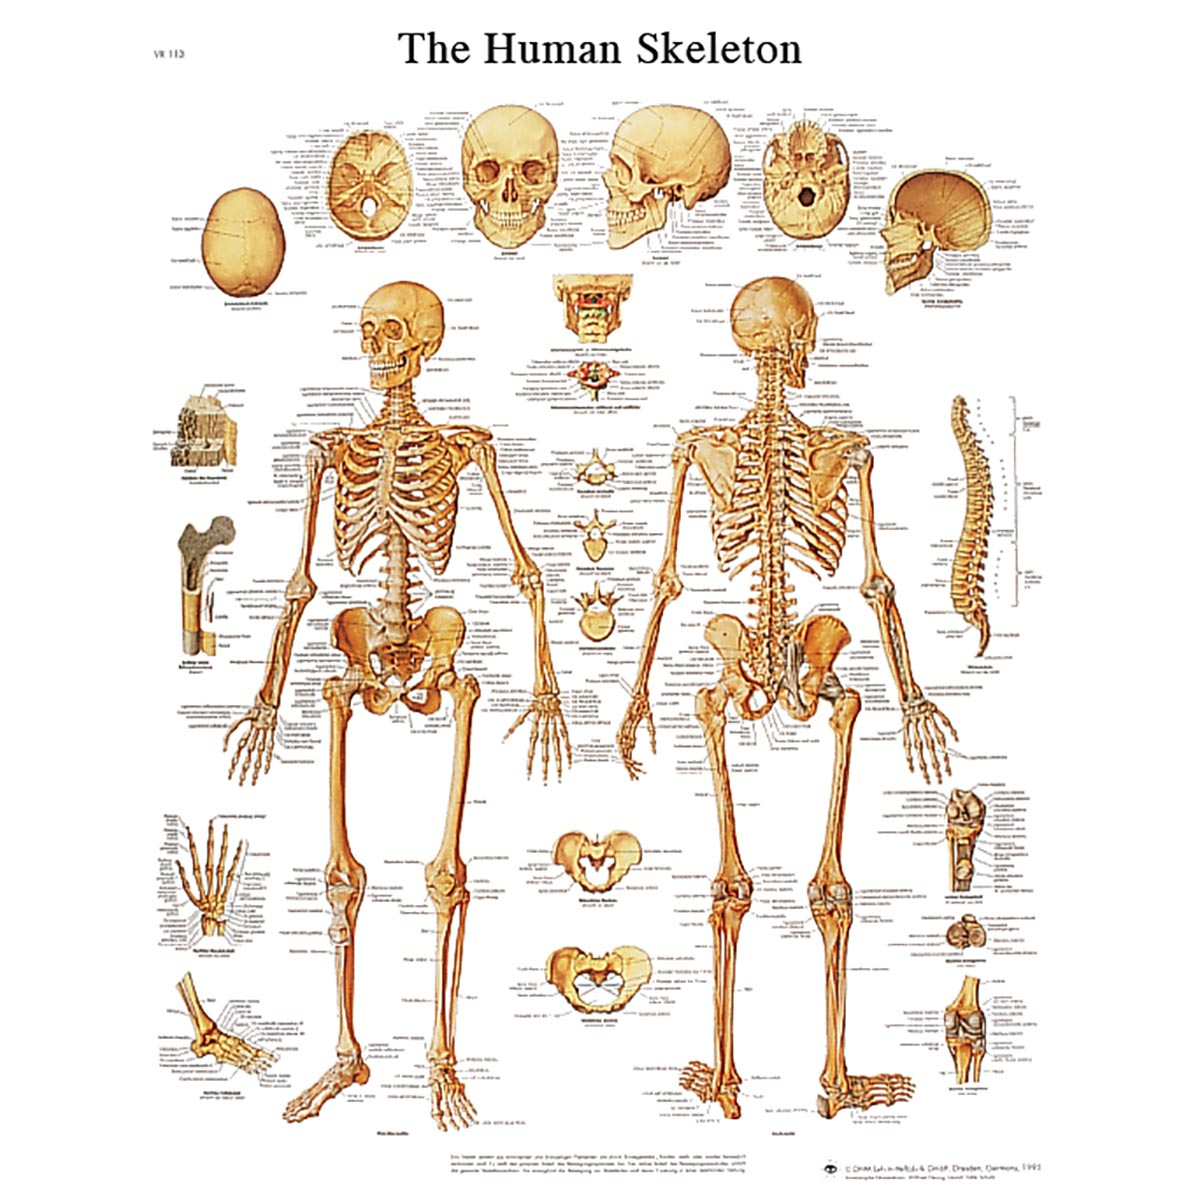 Human Skeleton Model Labeled Human skeleton stickychart